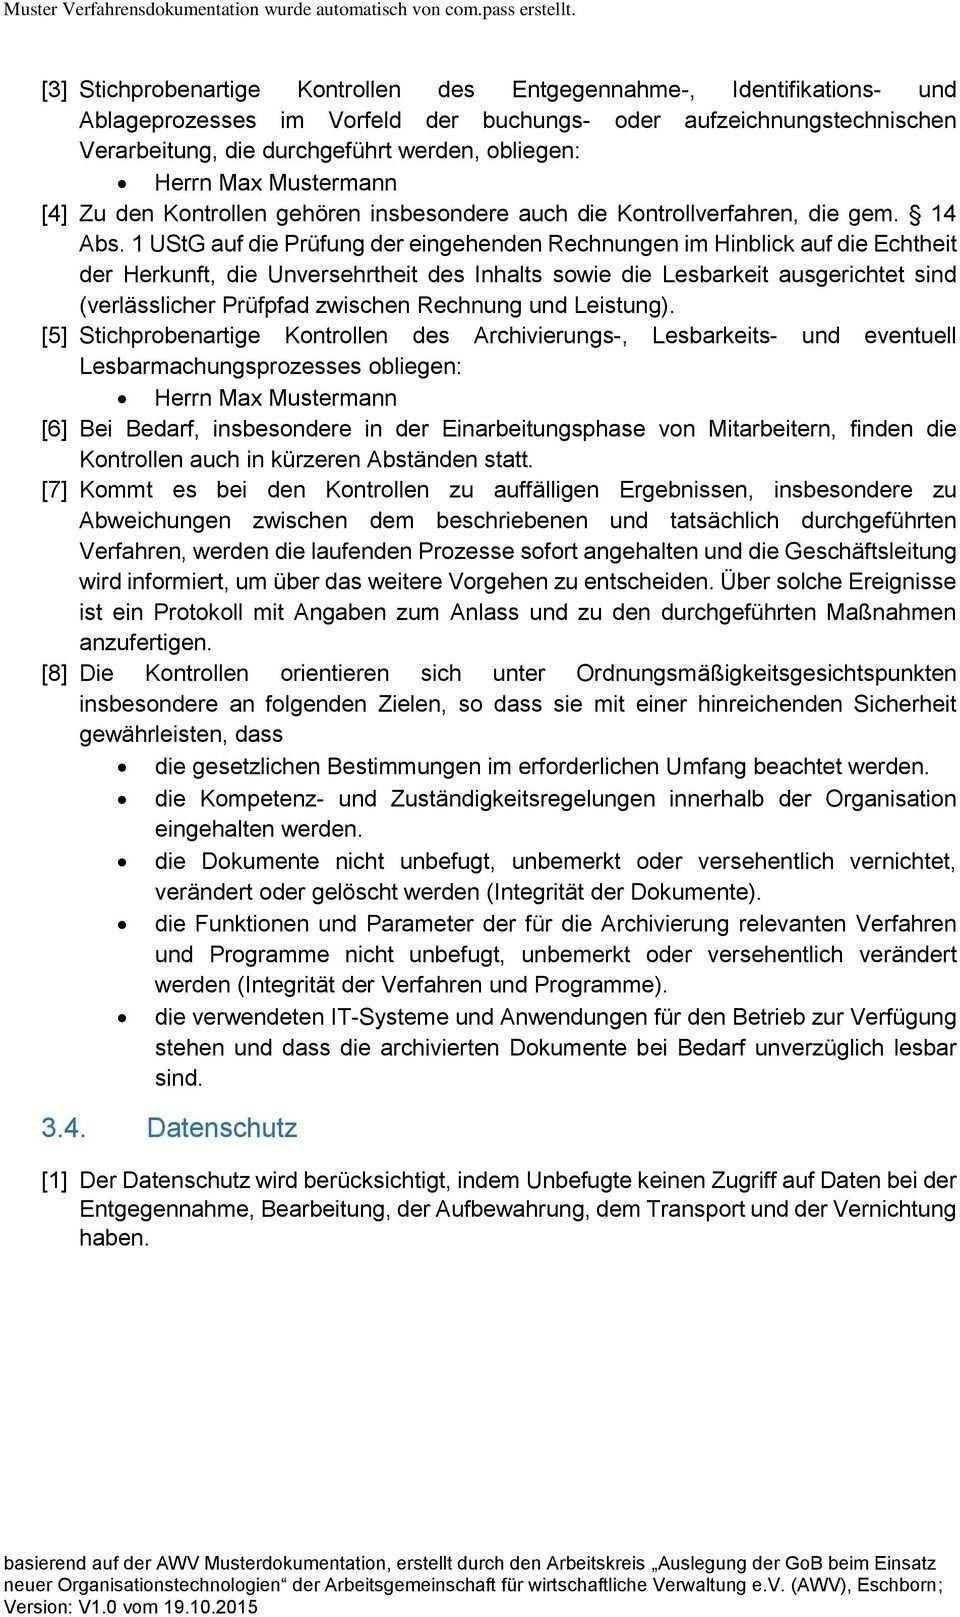 Muster Verfahrensdokumentation Zur Belegablage Pdf Free Download